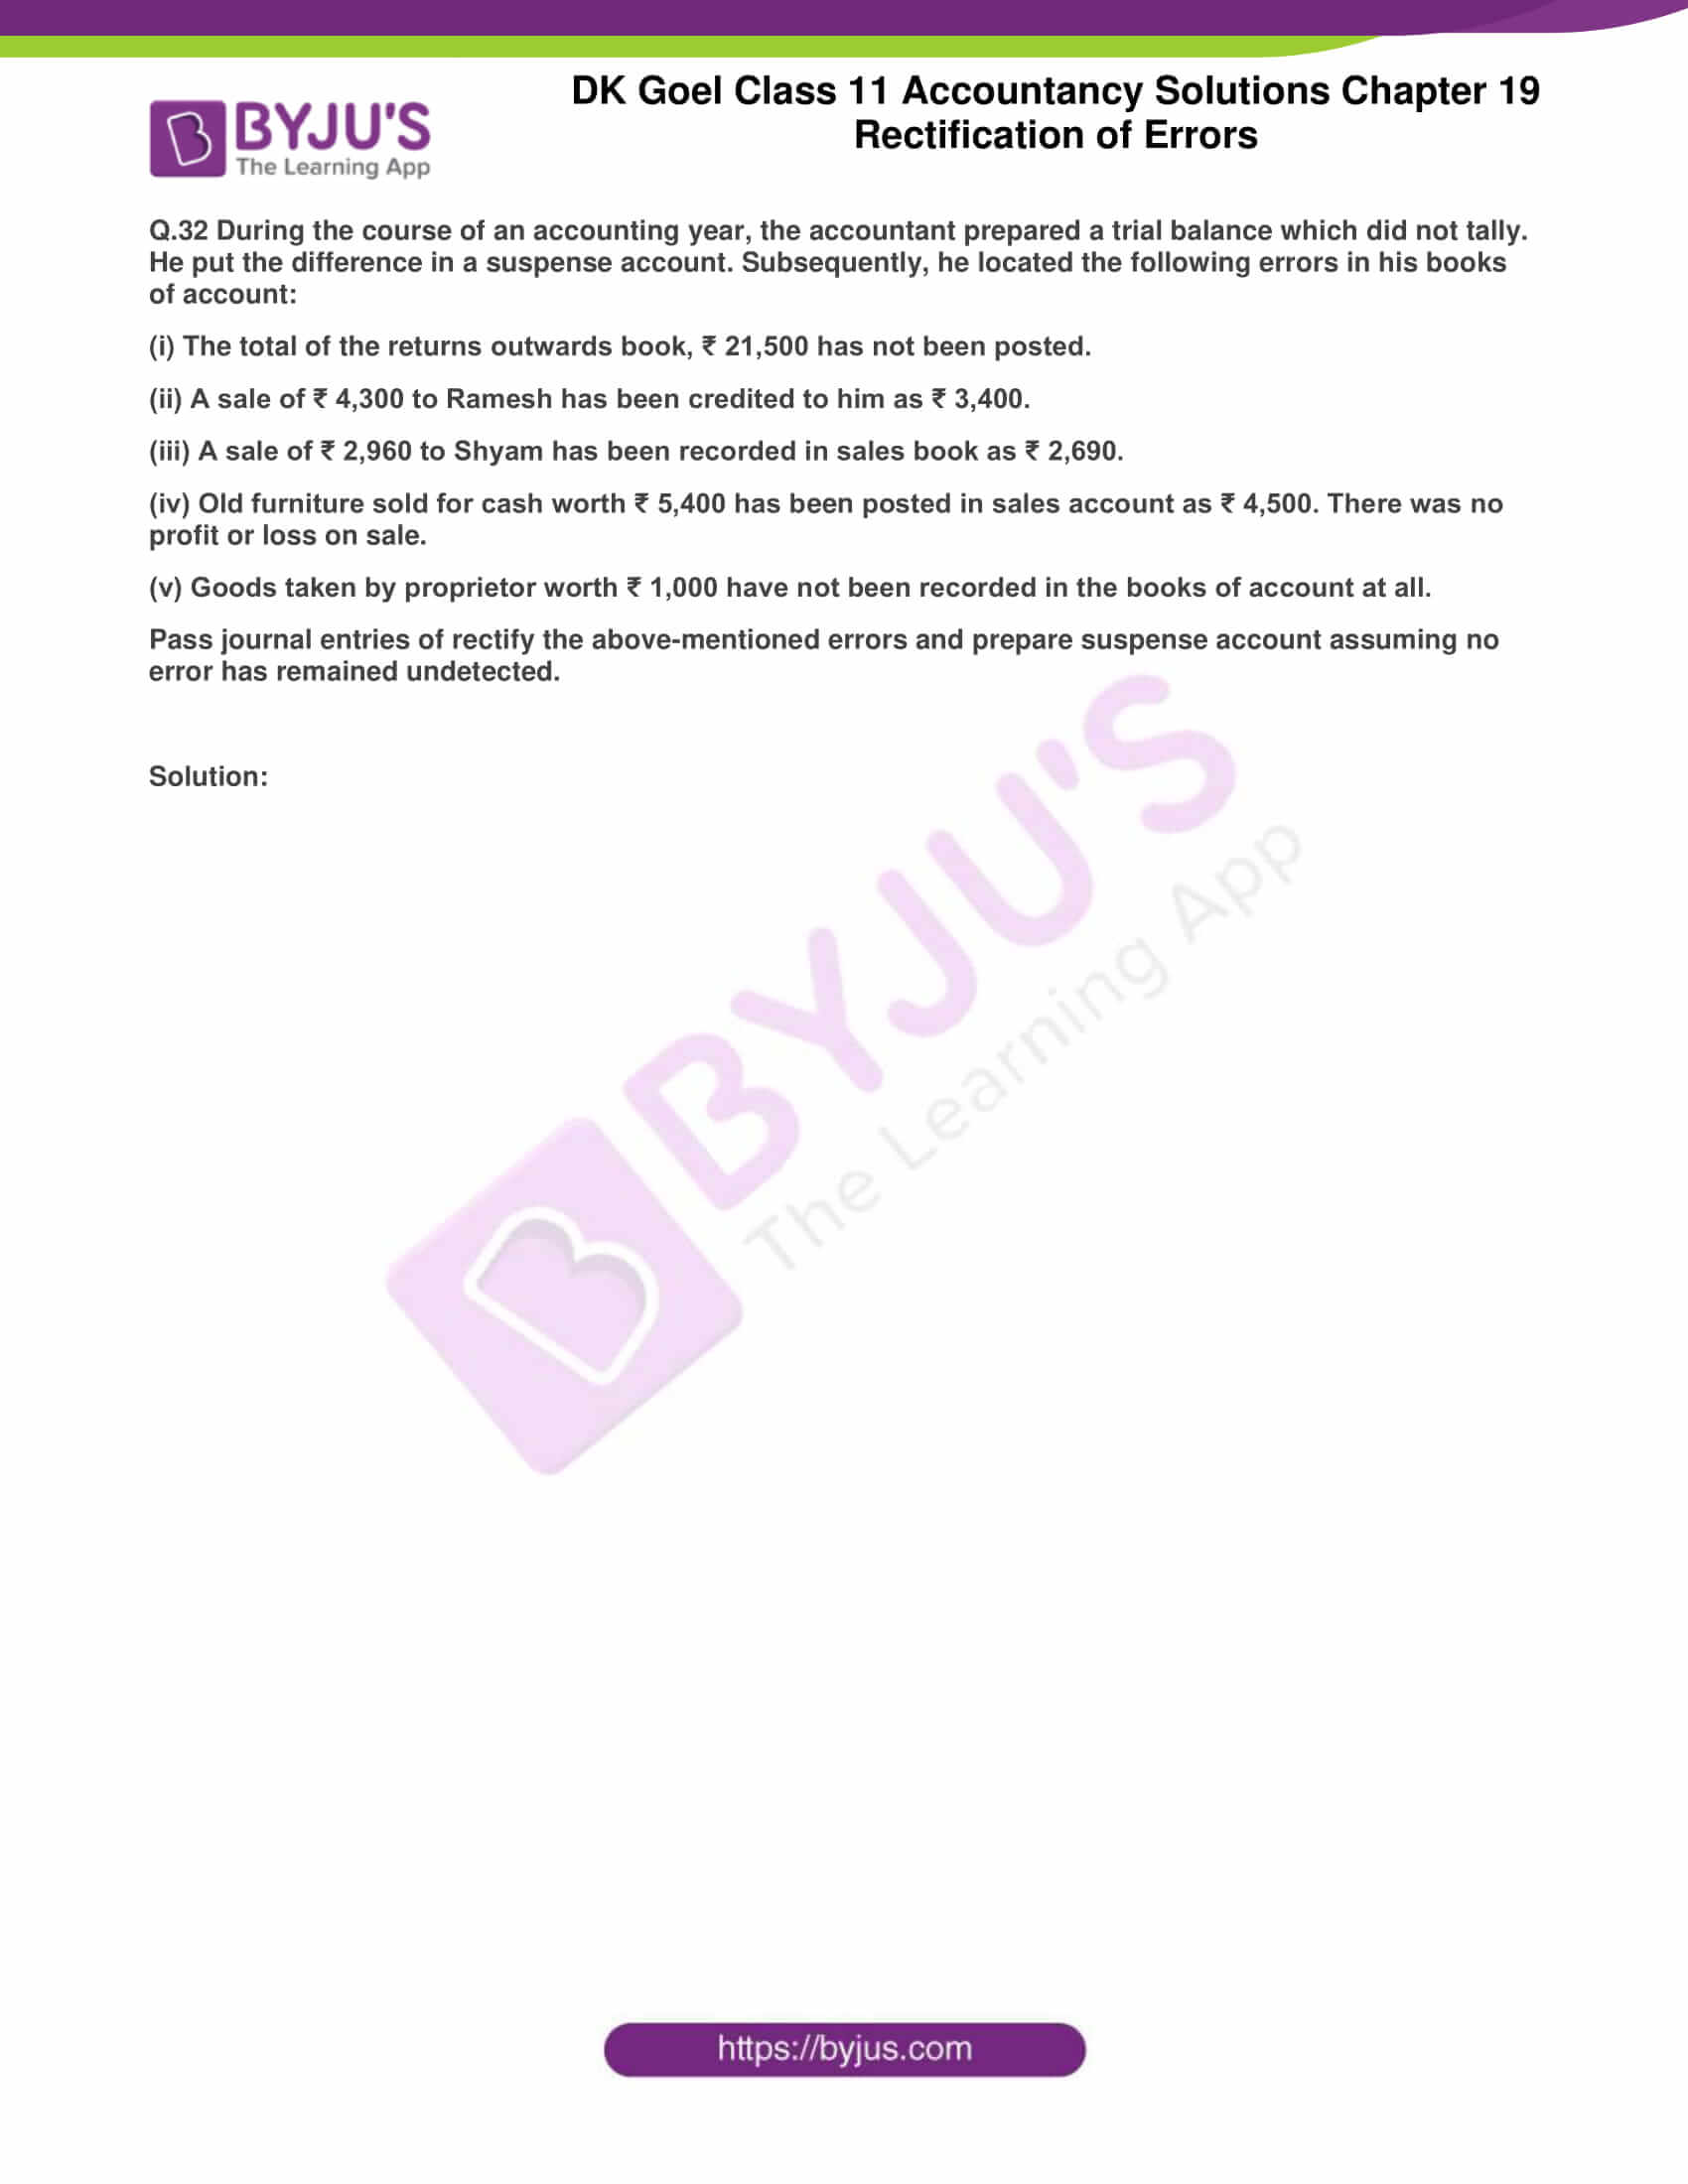 dk goel solutions class 11 accountancy chapter 19 rectification 61